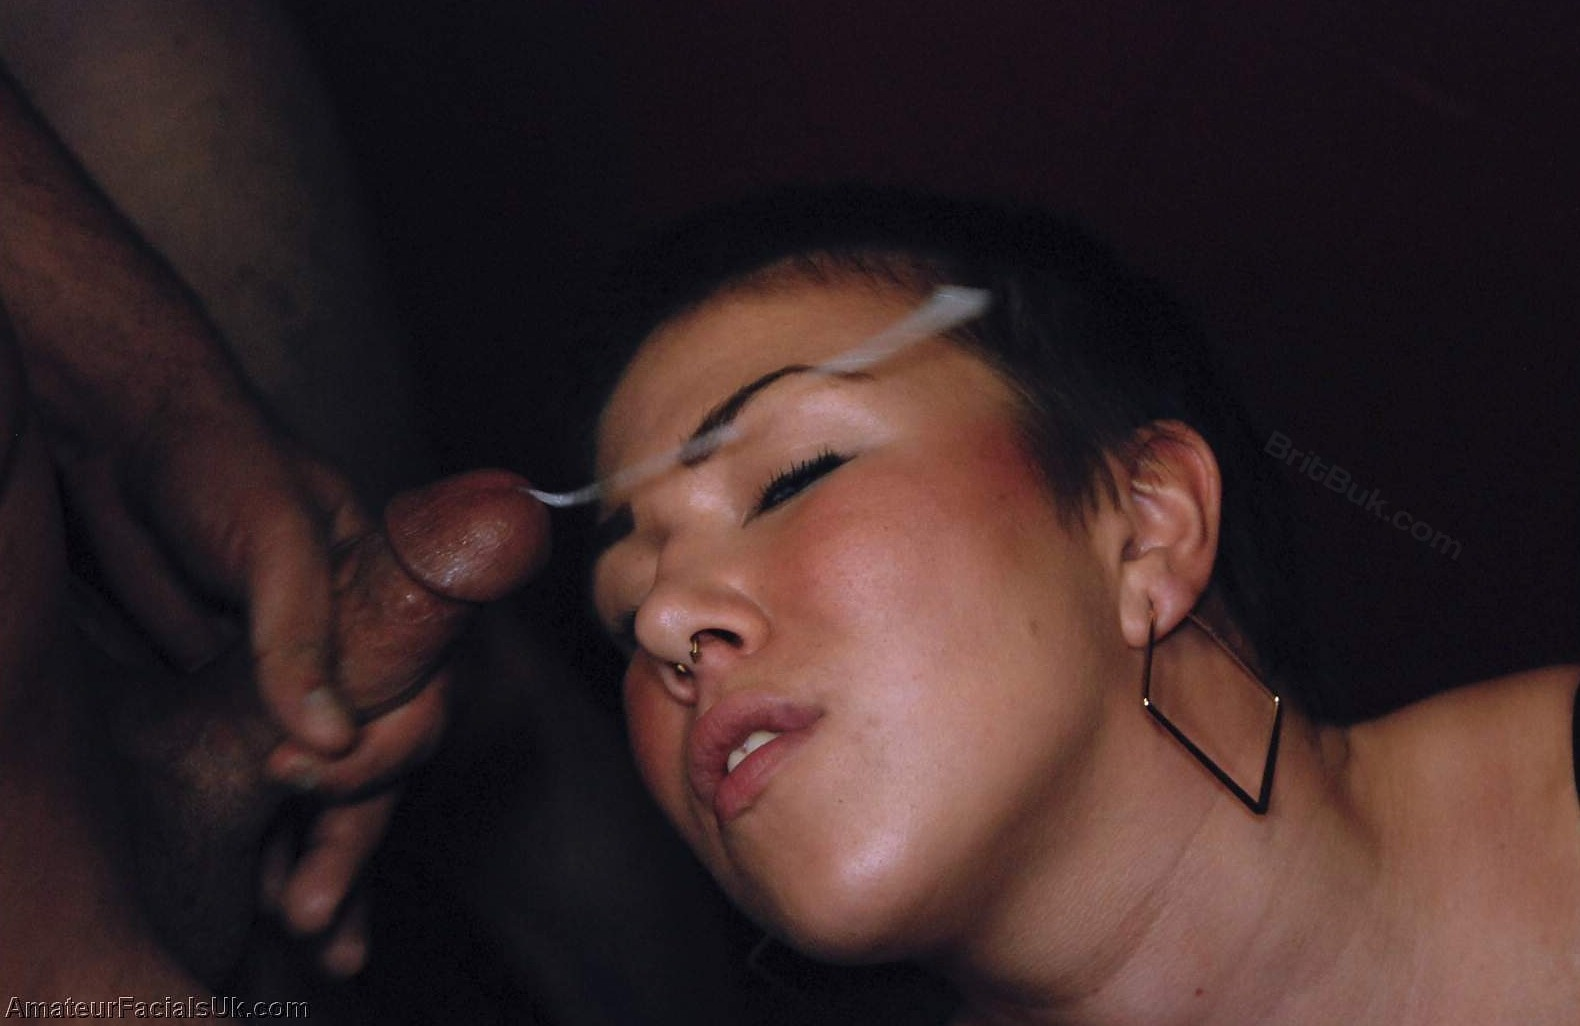 Chiara ShortHairandaSemenMask 016  Chiara, Sexy Short Hair & A Creamy Semen Mask!, Amateur British Bukkake